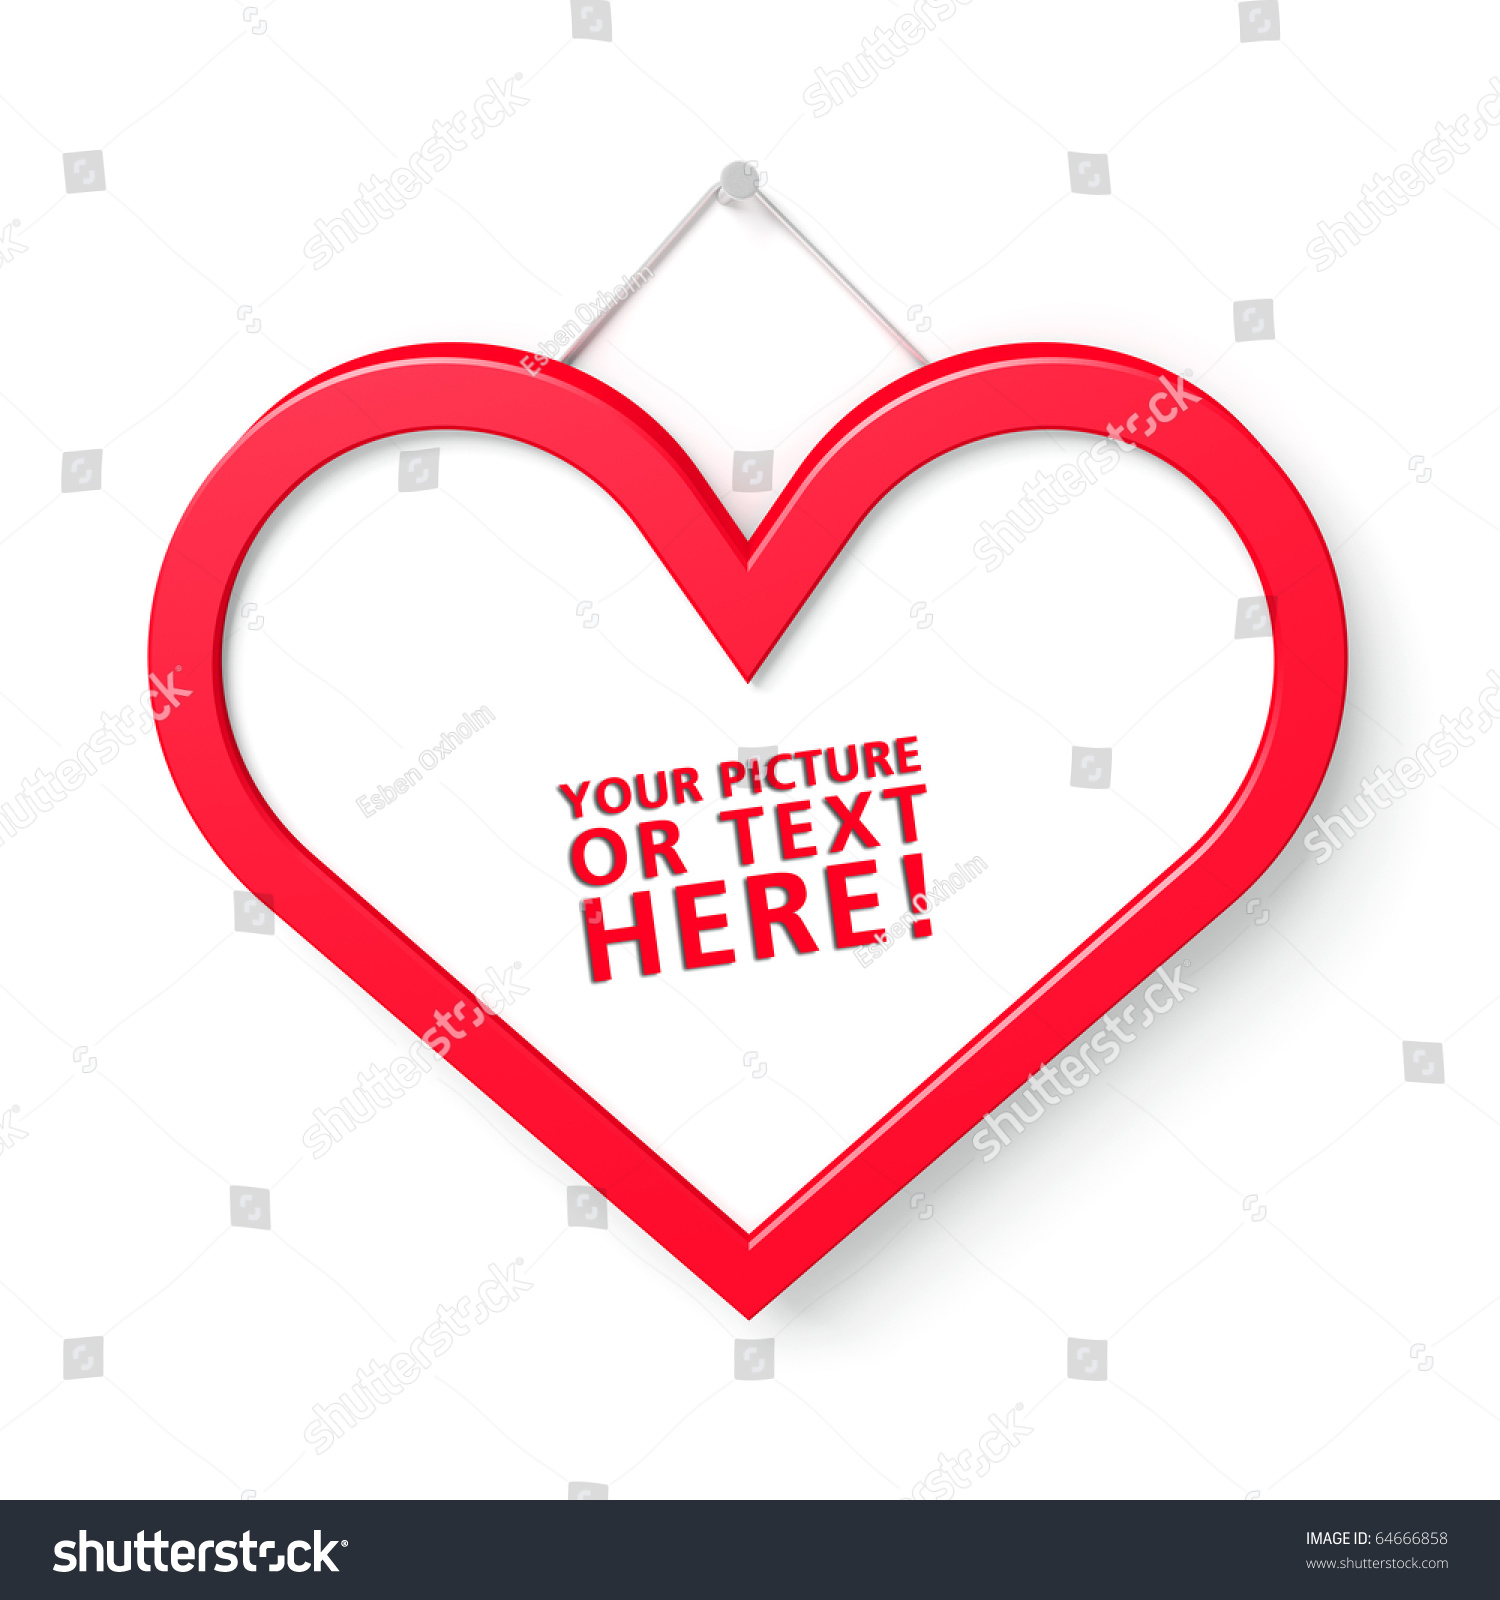 Red Heart Shaped Frame Room Photo Stock Illustration 64666858 ...